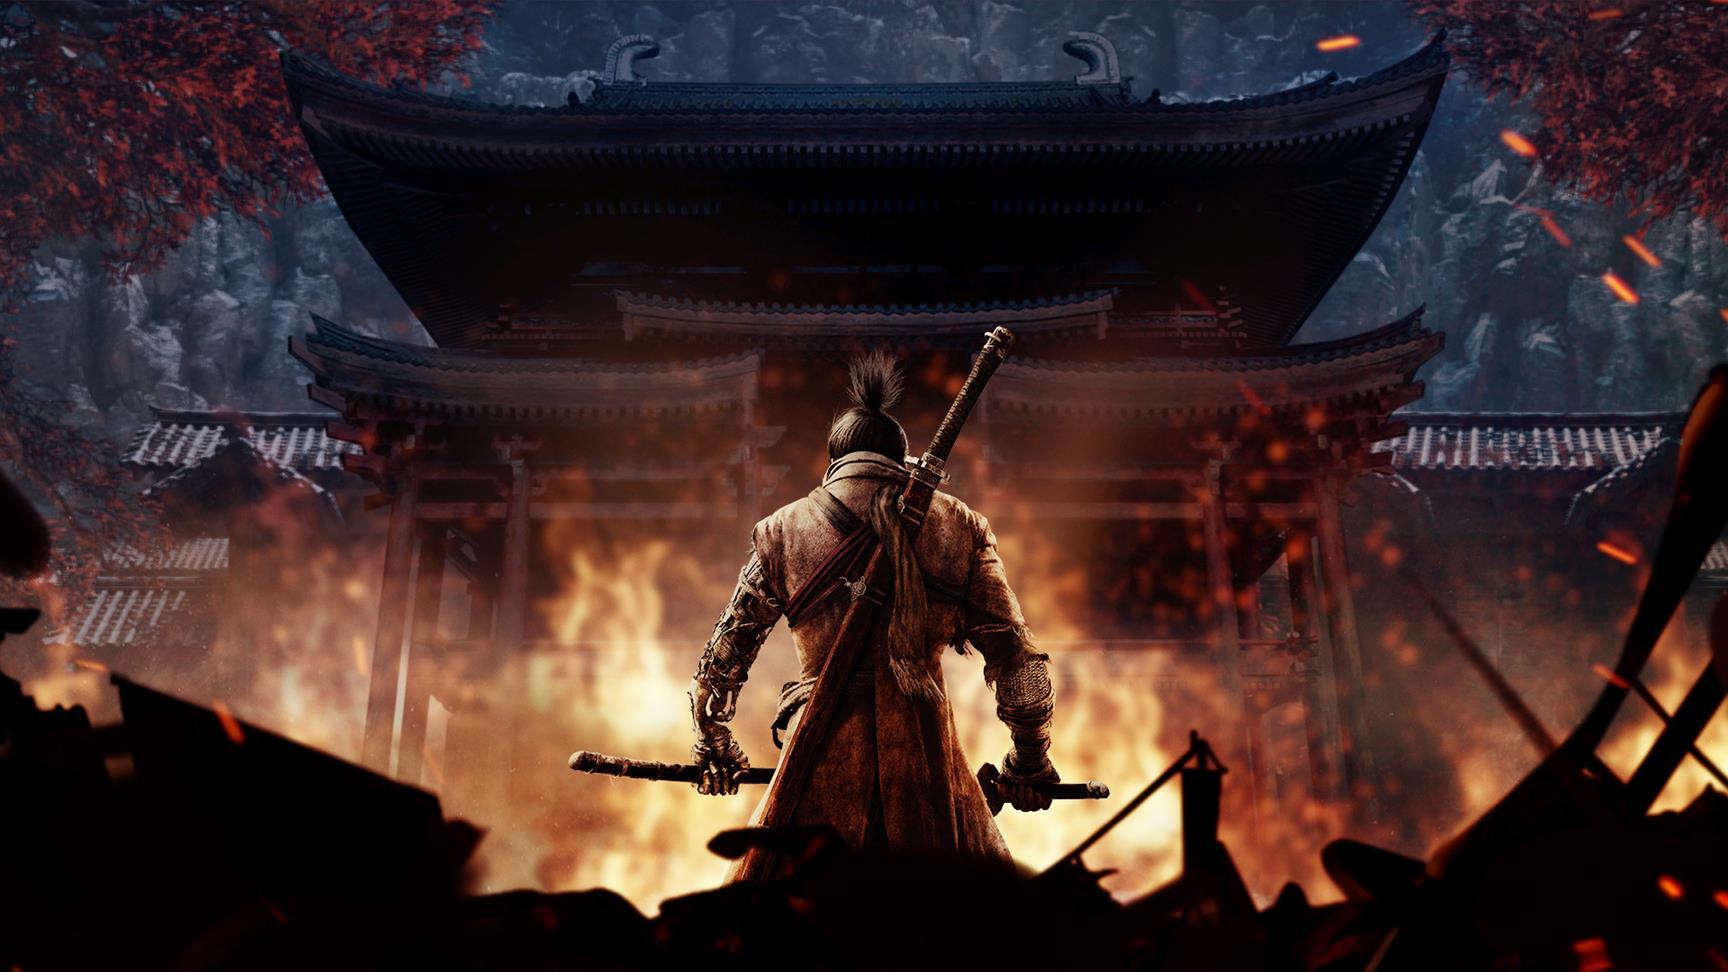 sekiro temple back 1